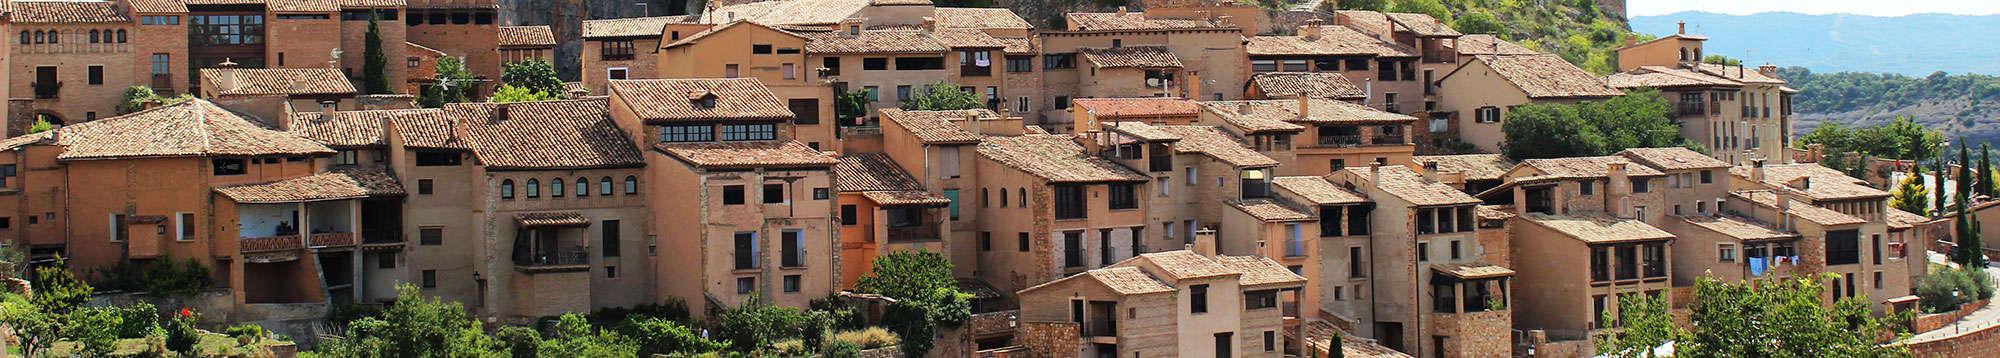 Escapadas fin de semana en Aragón